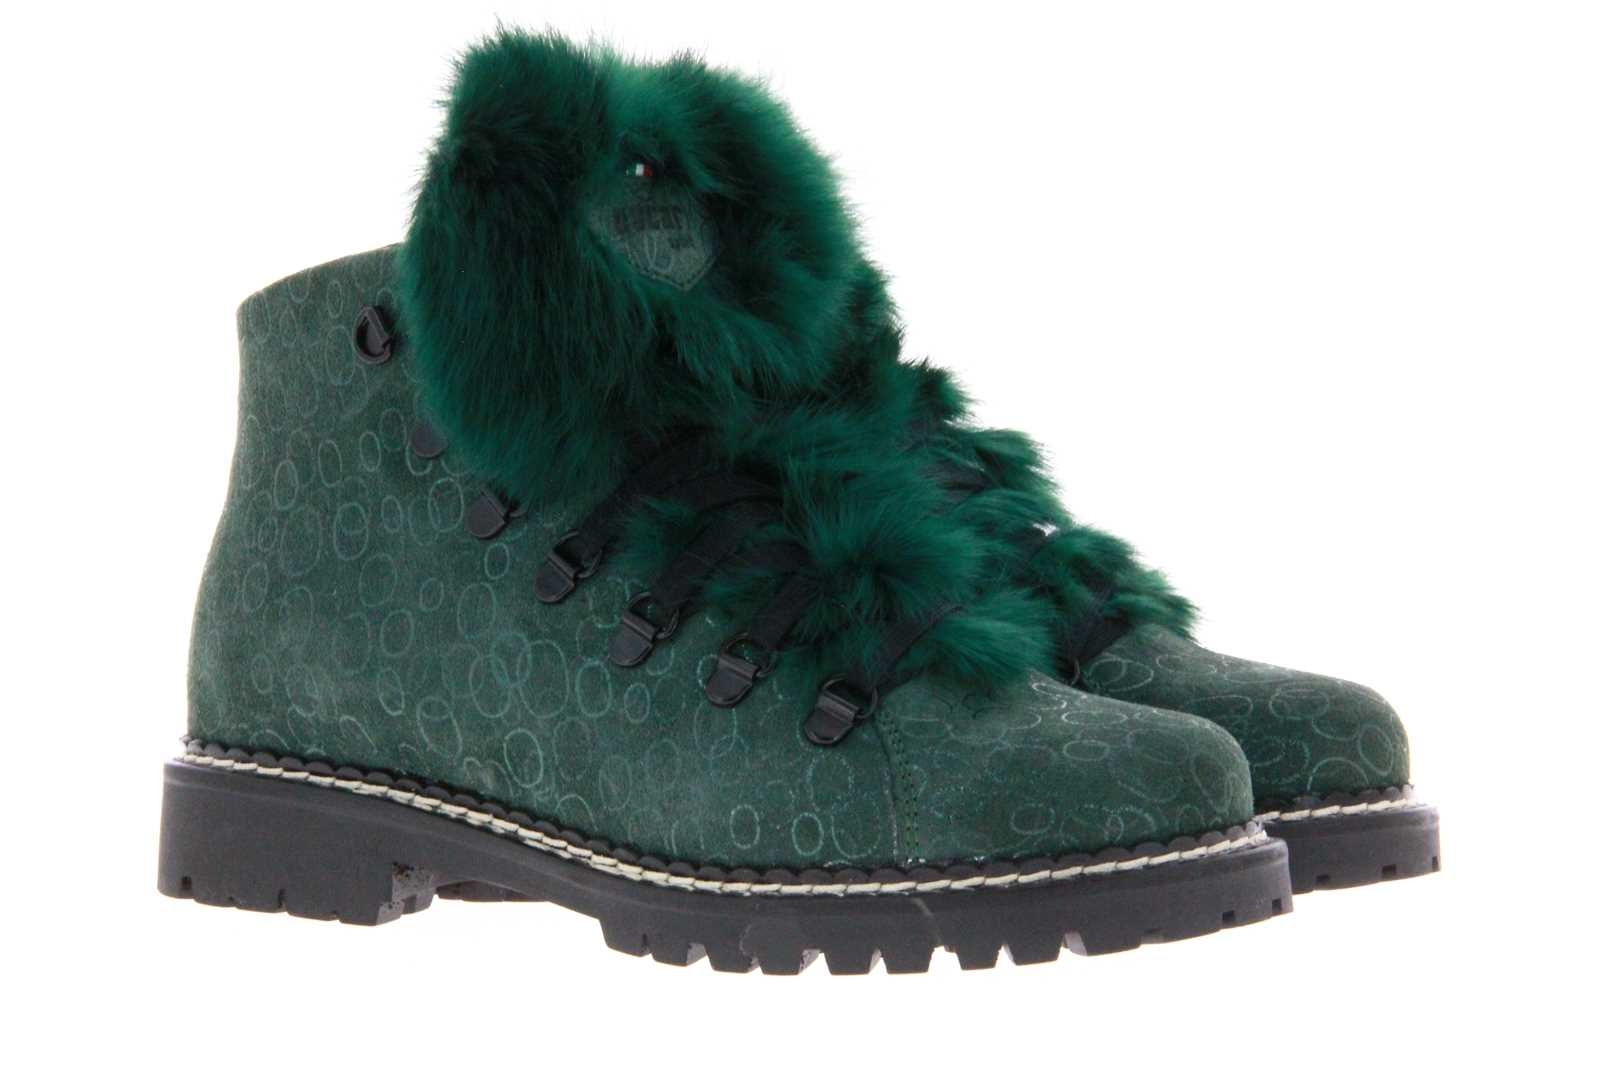 Oscar Sport lace-up boots B-600-GU VERDE